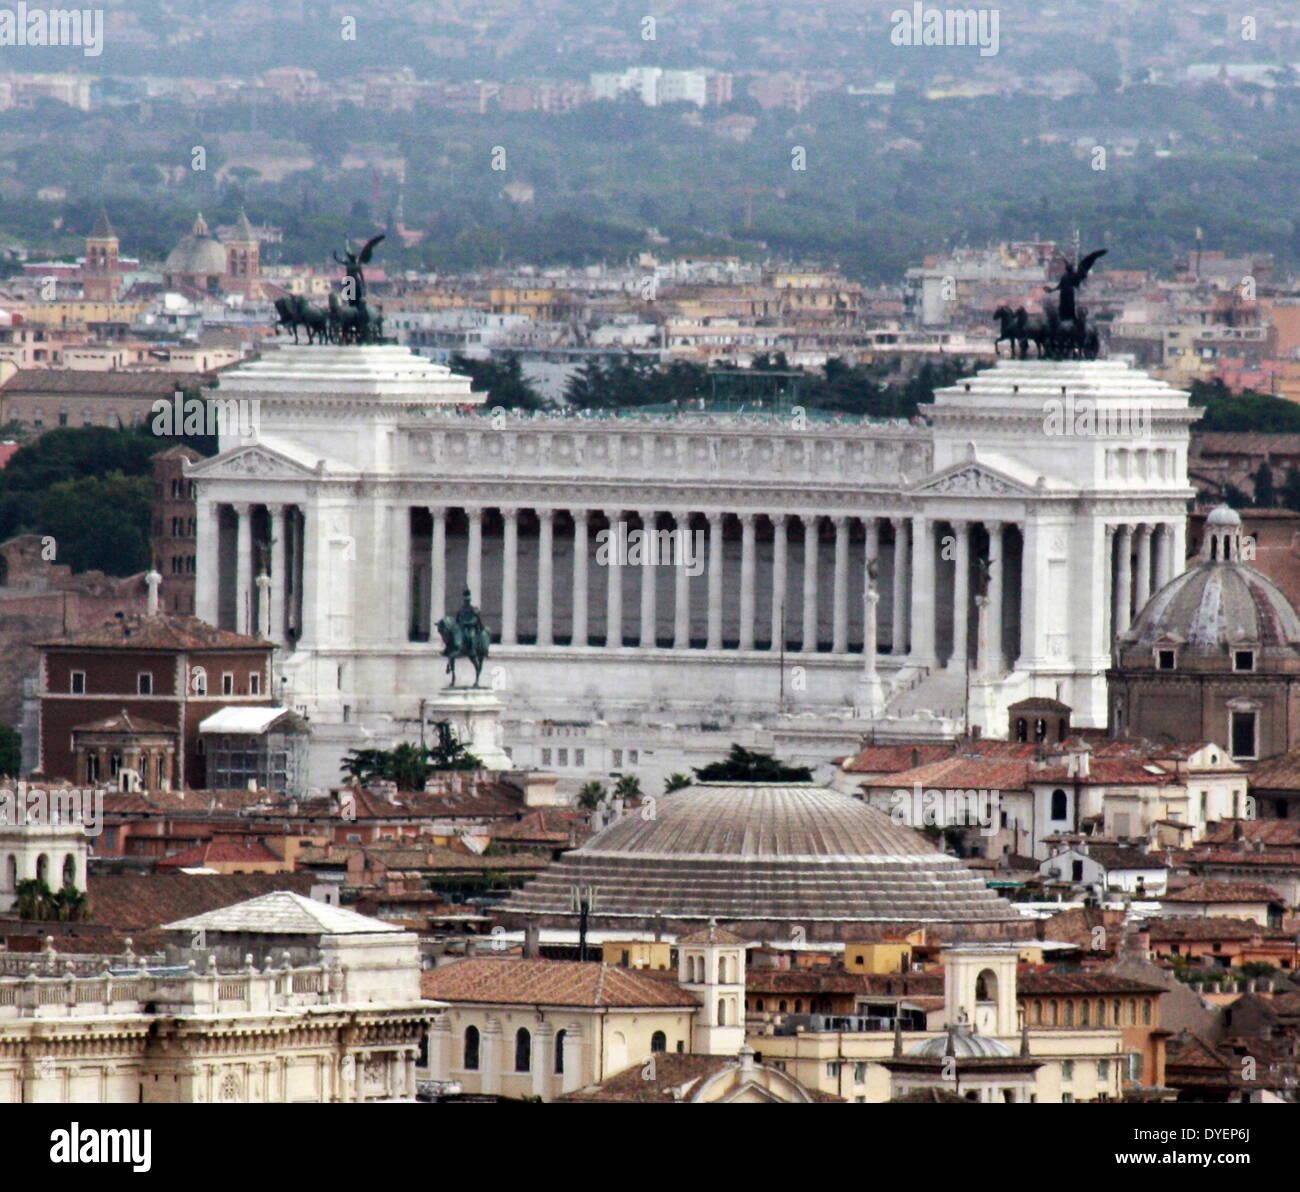 The Monumento Nazionale a Vittorio Emanuele II or 'Il Vittoriano' is a monument in Rome - Stock Image